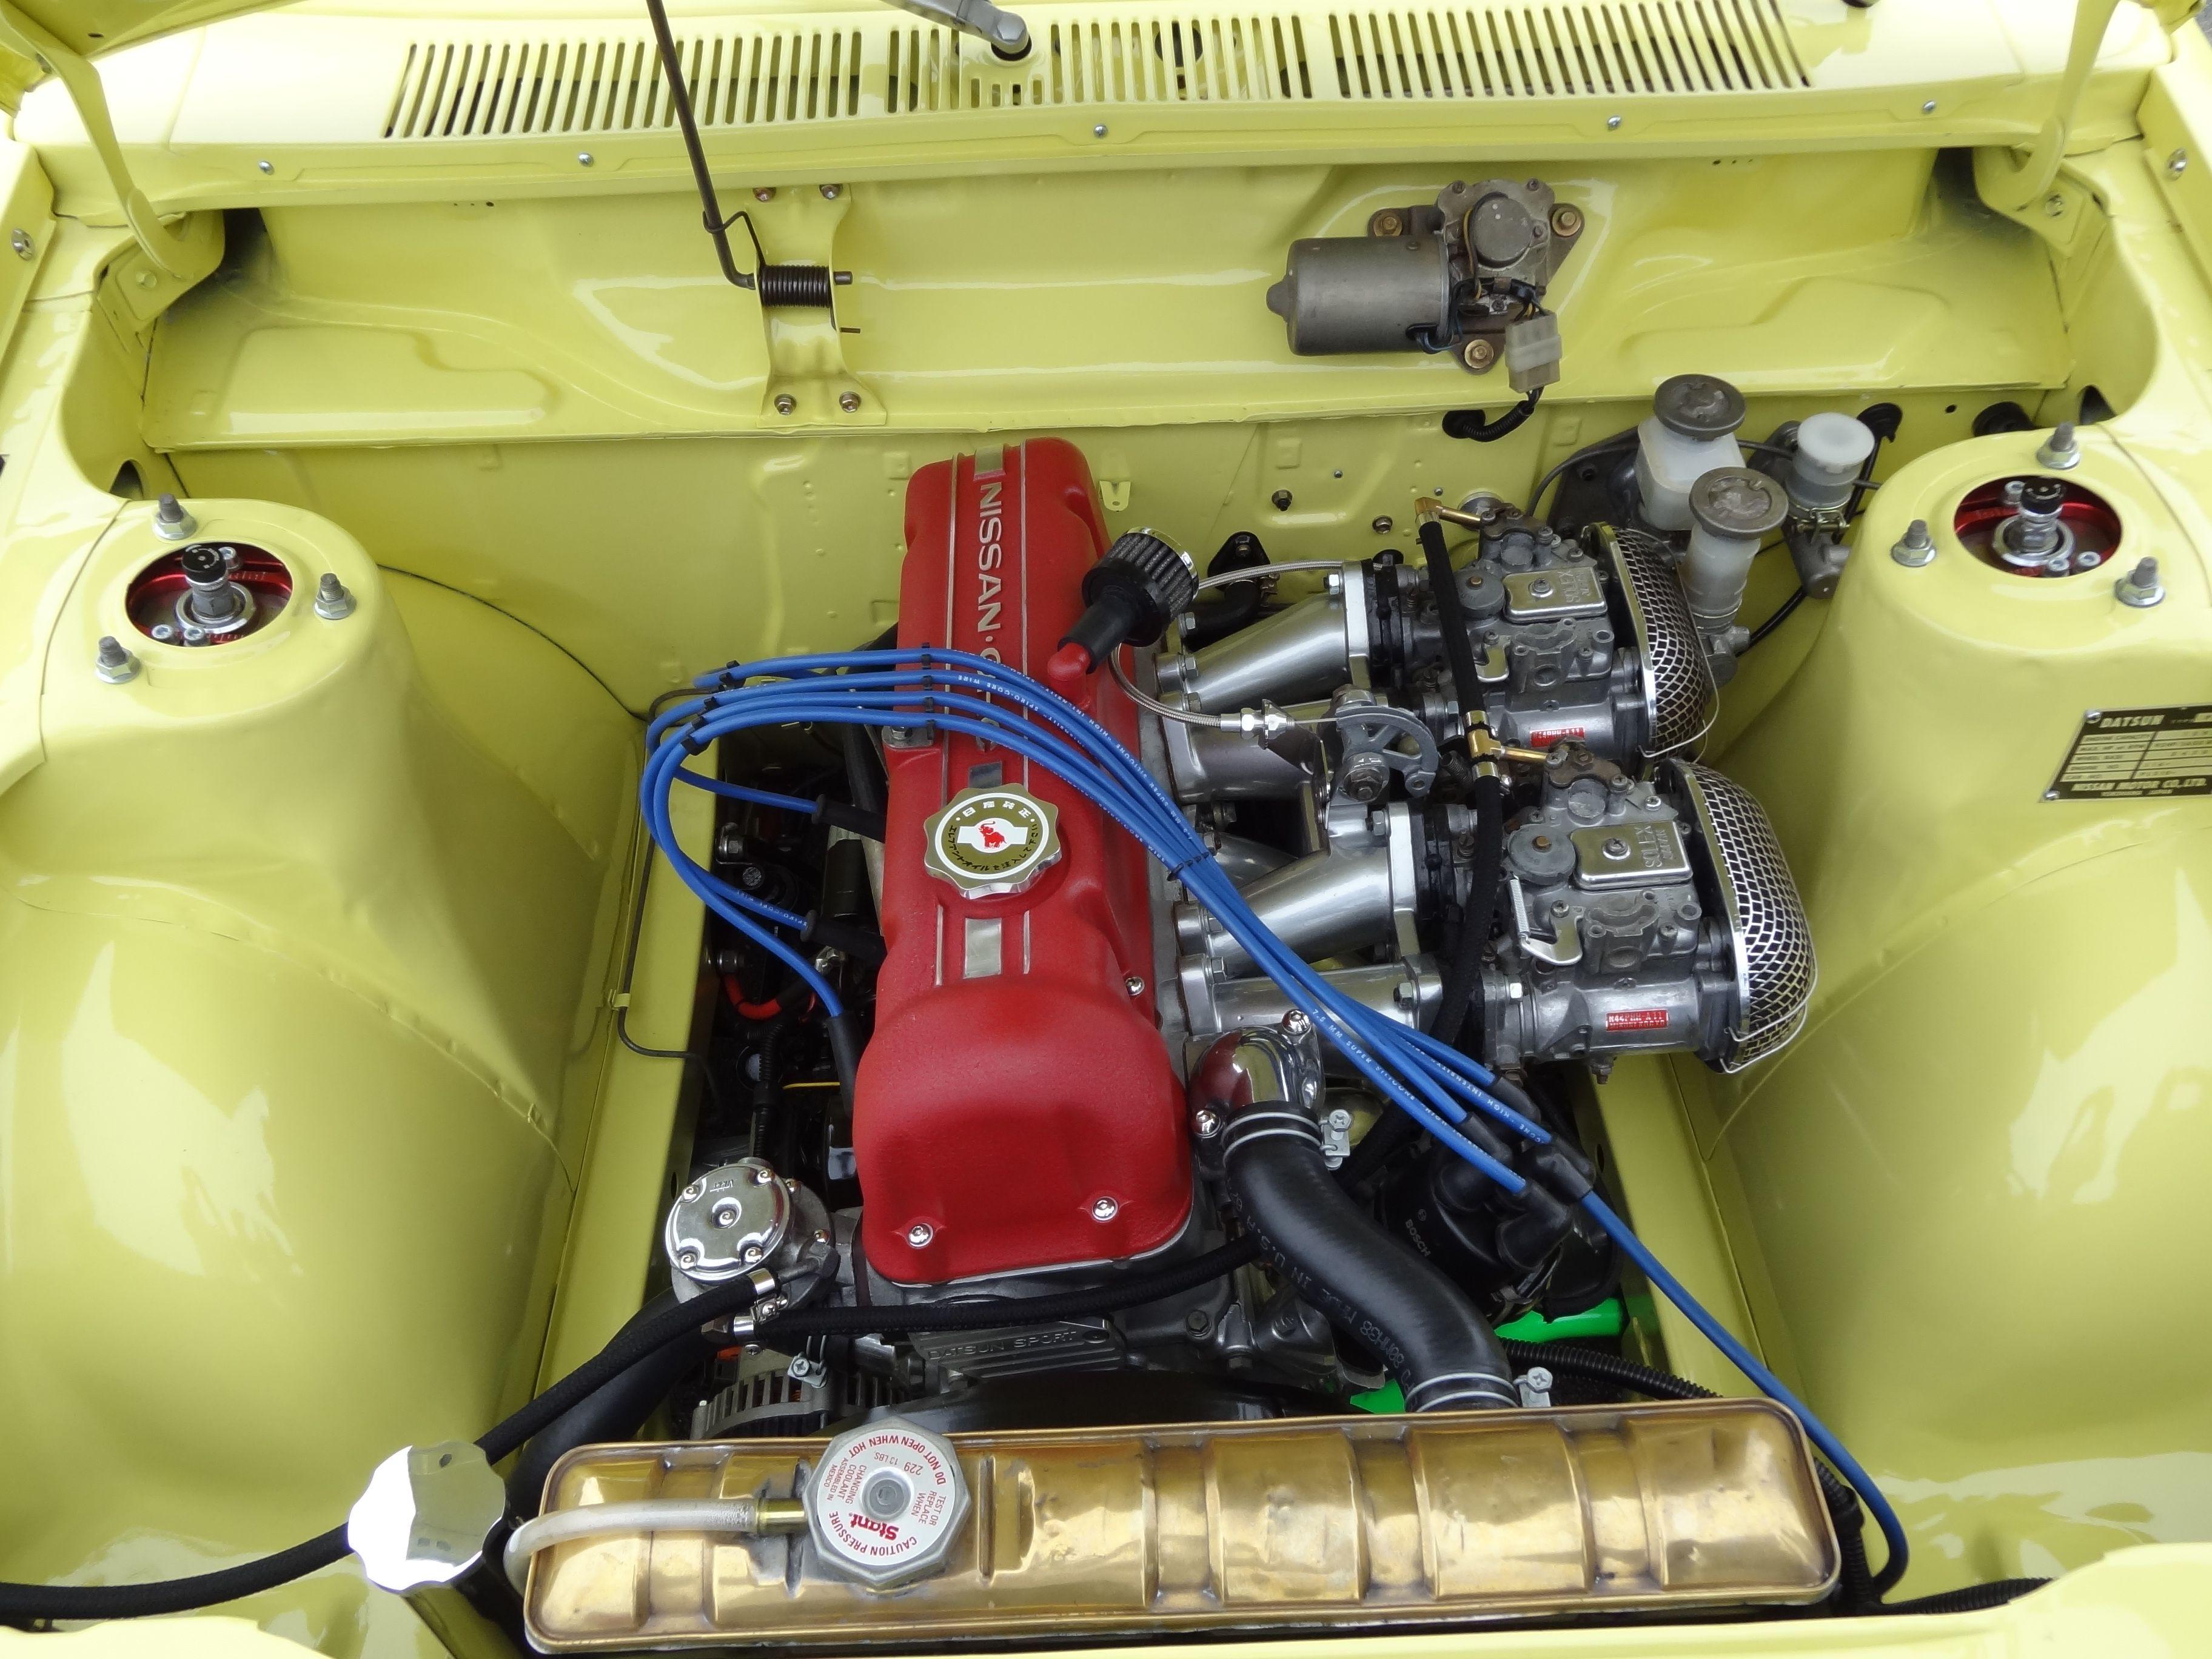 Image result for Nissan L18 engine bay | Datsun 720 4x4 ...